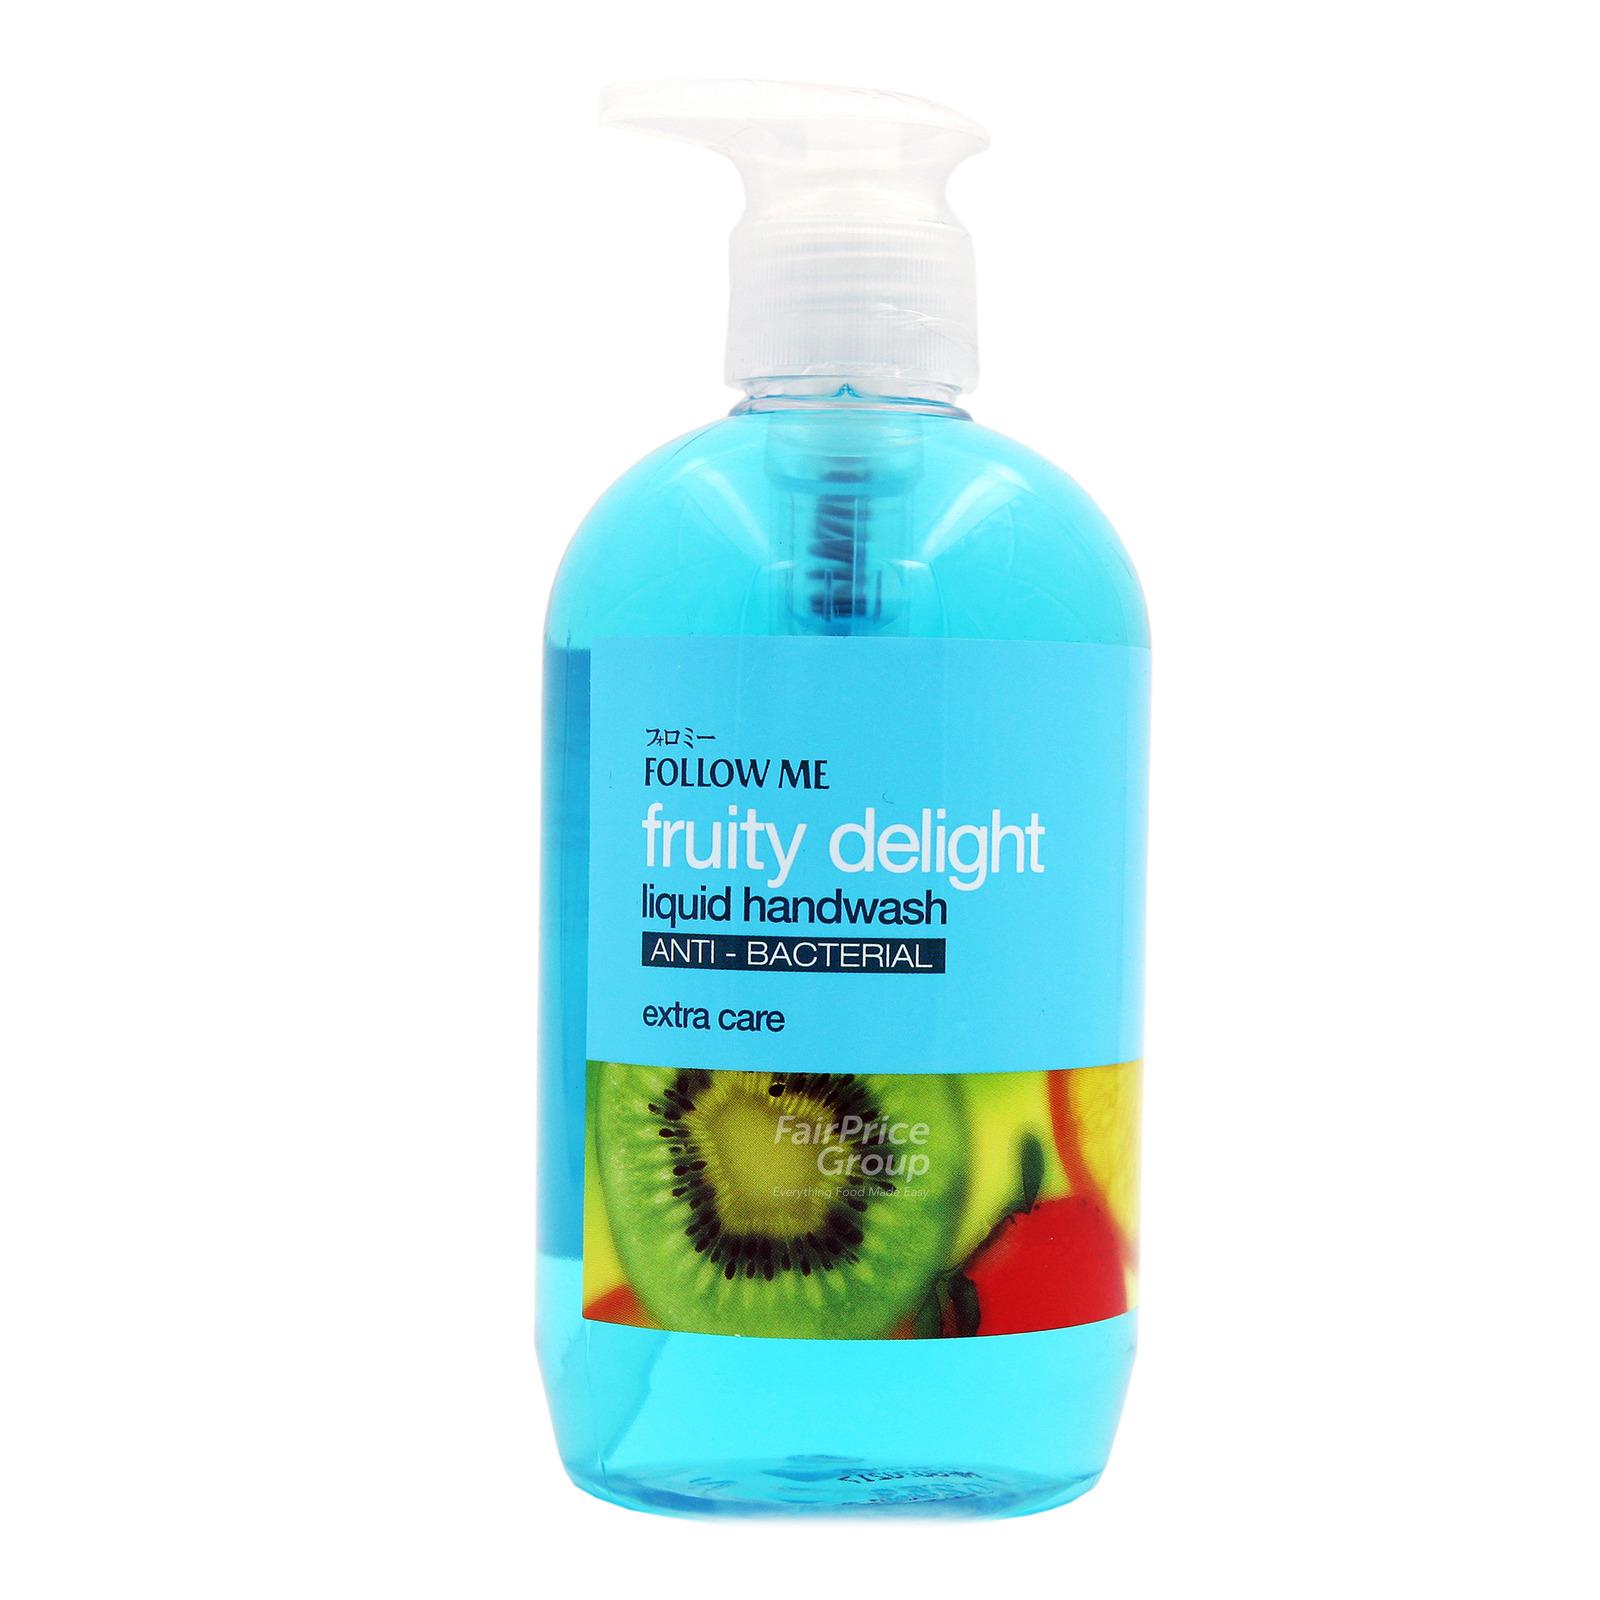 Follow Me Anti-bacterial Handwash - Fruit Delight